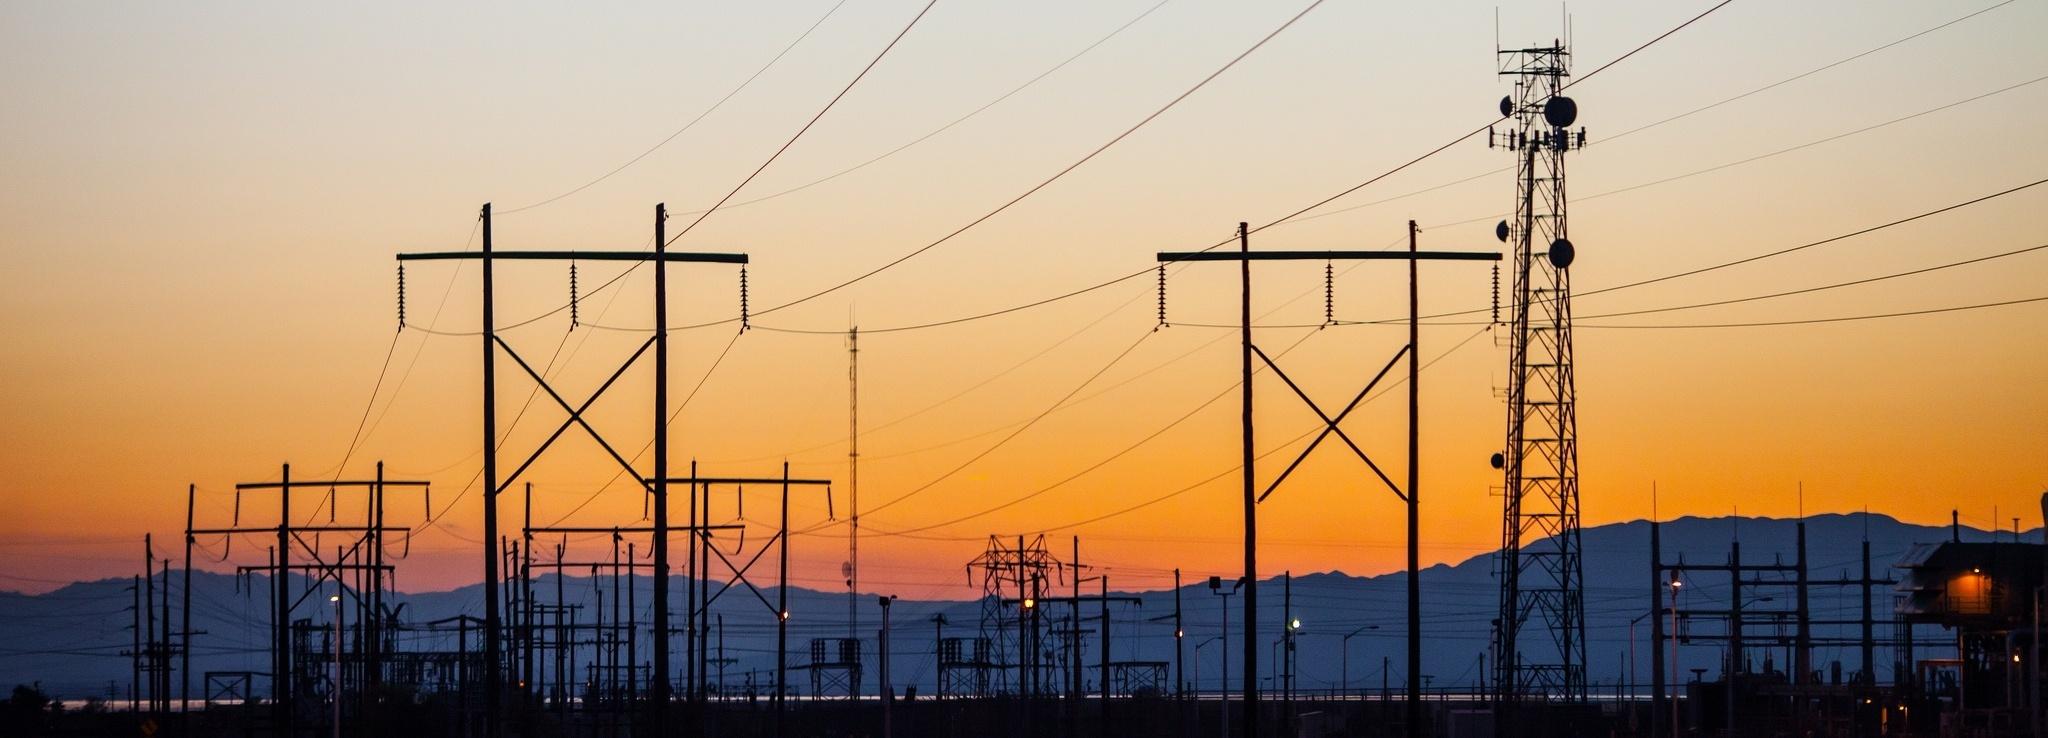 Thomas Hawk power lines-592738-edited.jpg